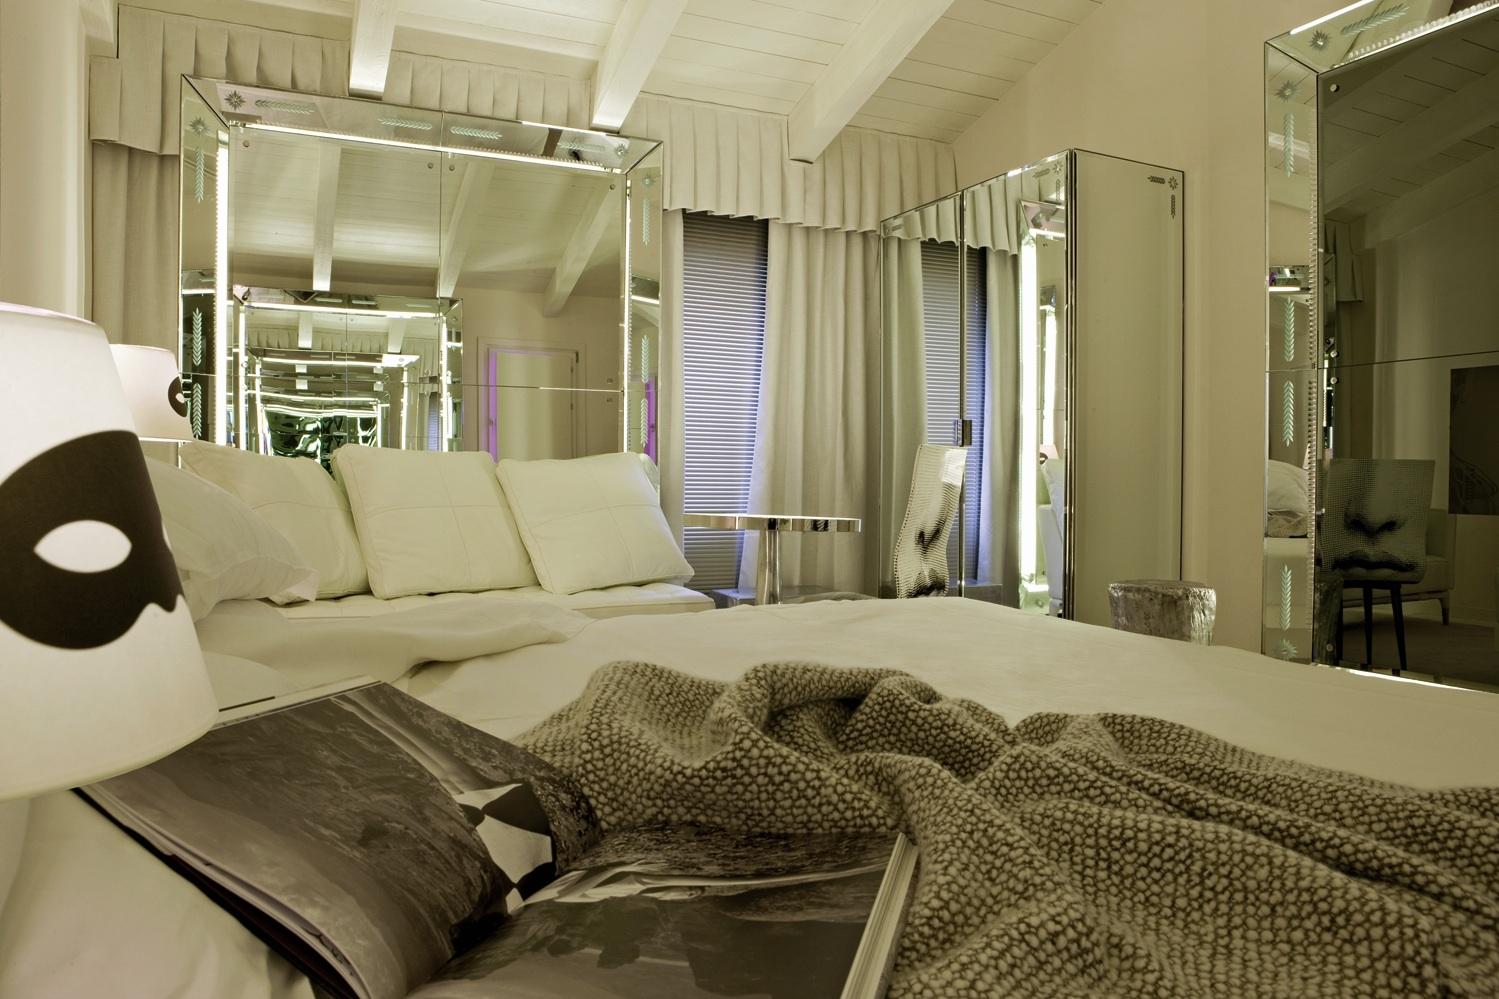 Maison grace philippe starck palazzina grassi hotel venice for Hotel design venice